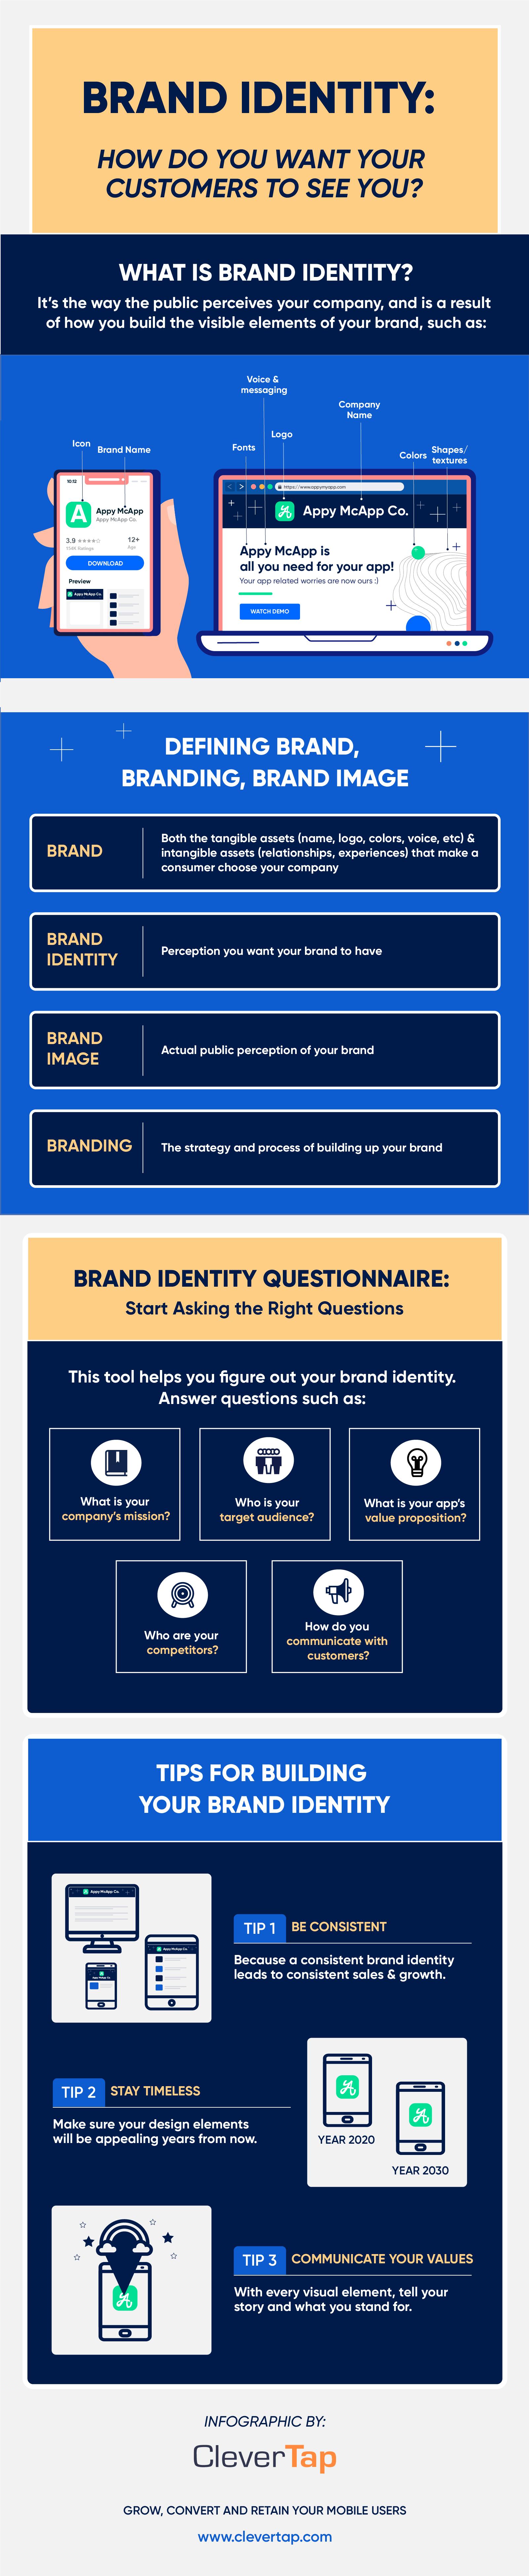 Brand Identity infographic